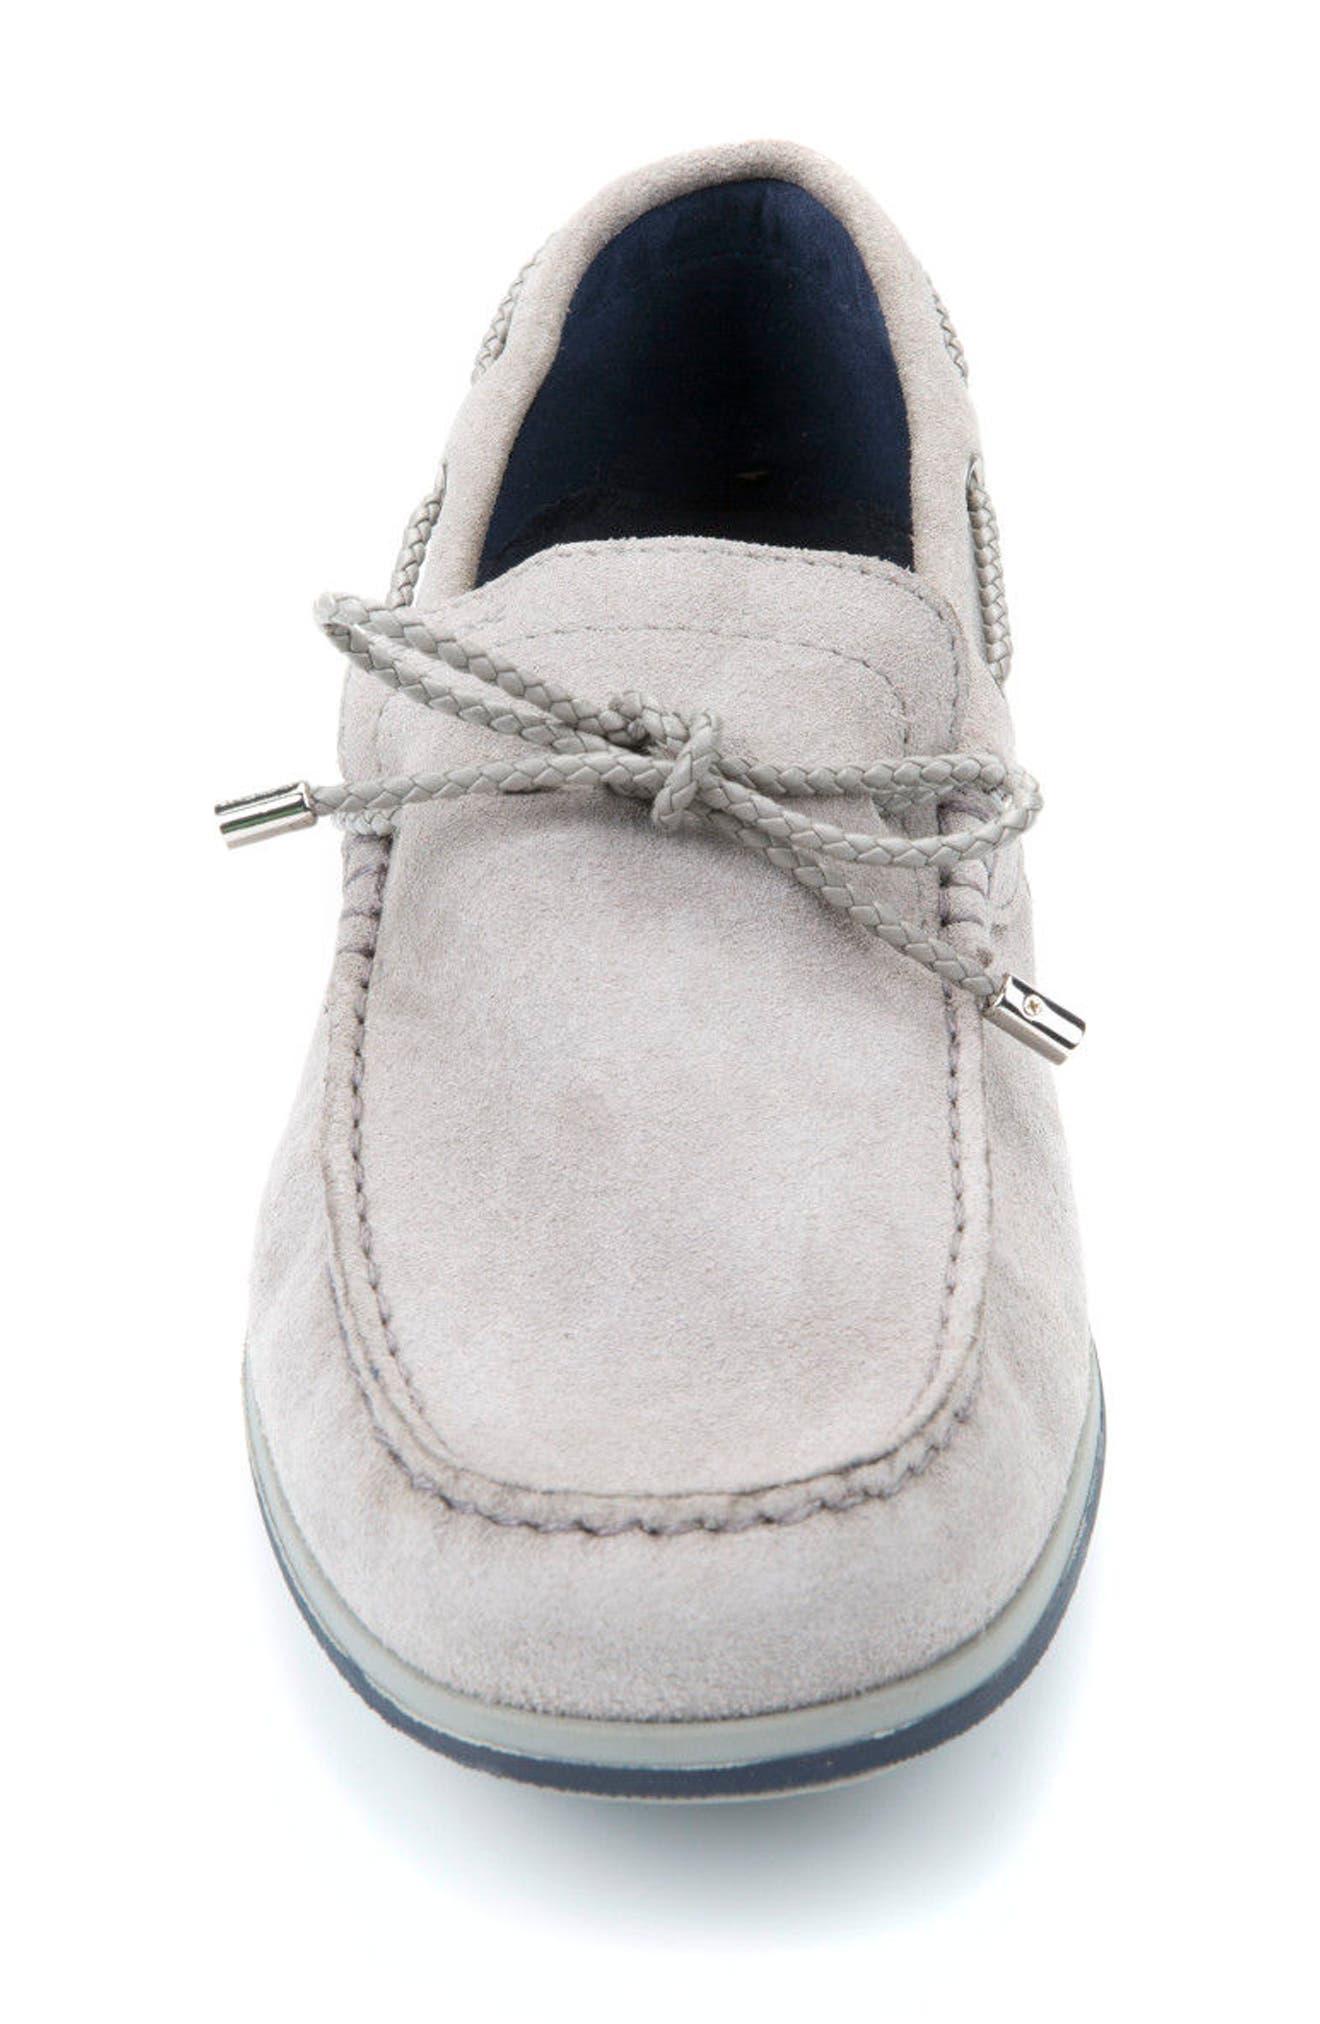 Mirvin 2 Boat Shoe,                             Alternate thumbnail 4, color,                             030